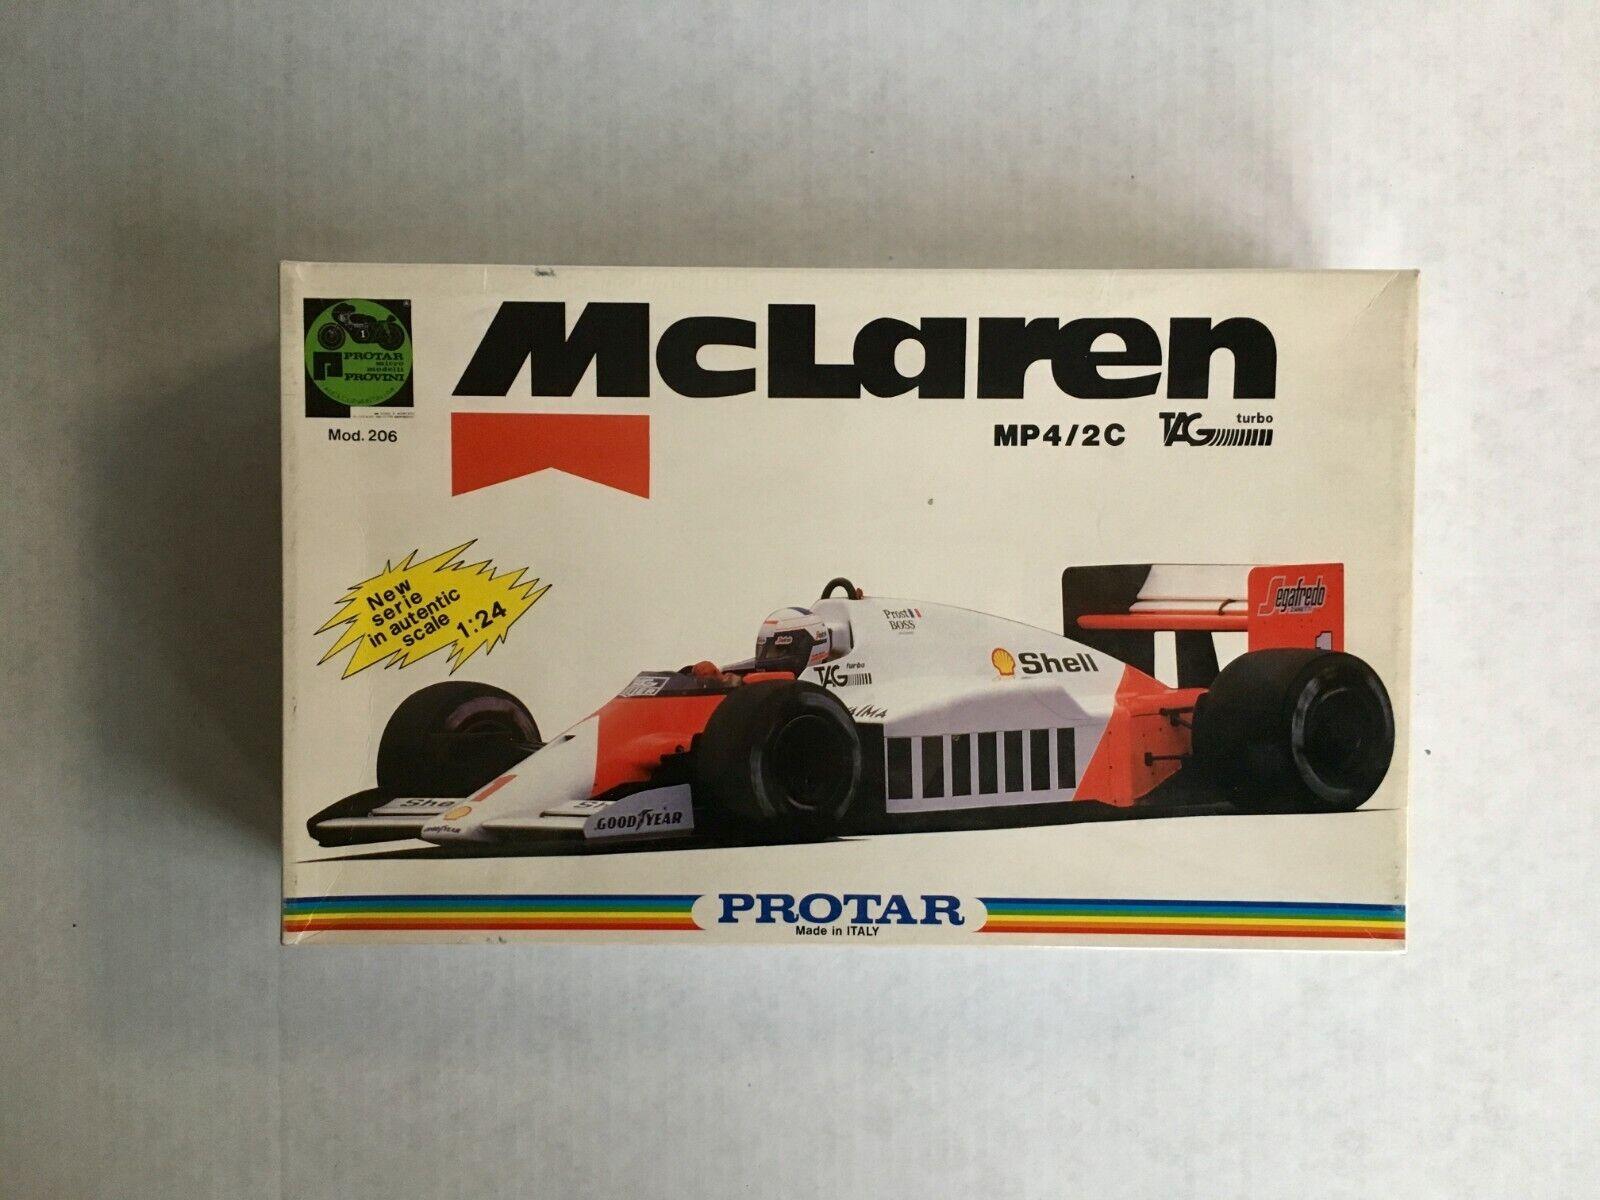 McLaren MP4 2C World Champion 1986 Alain Prost.1  24 scale Prostar Made in